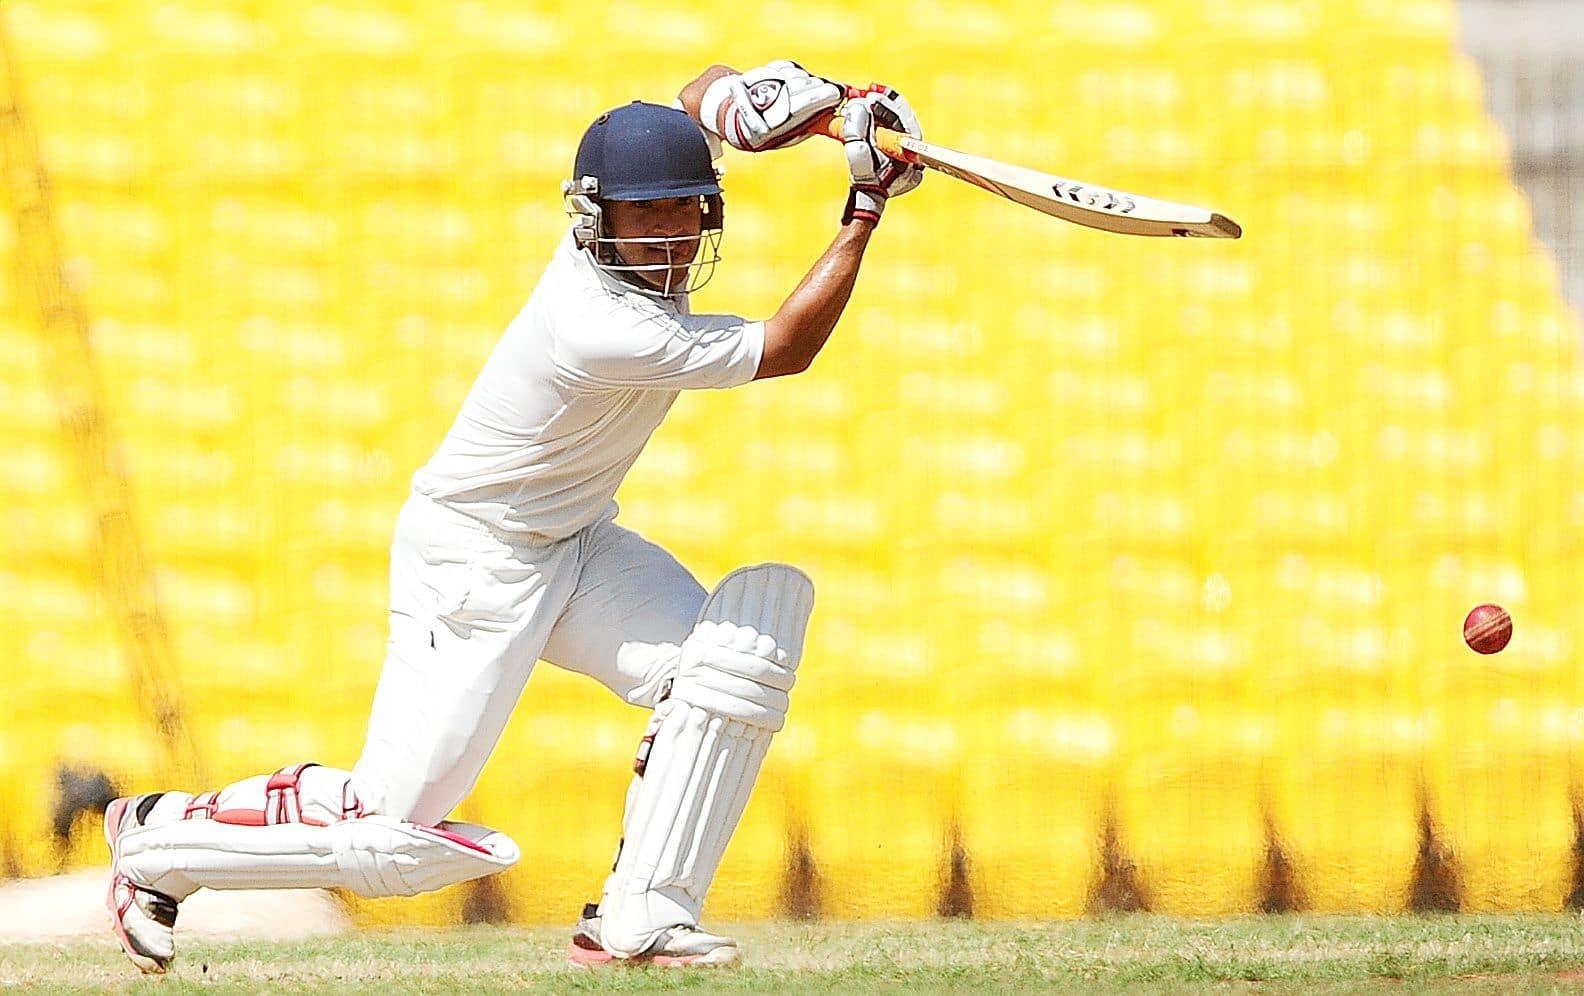 Robin Bist has been a pillar of Rajasthan cricket, twice winning the Ranji Trophy.